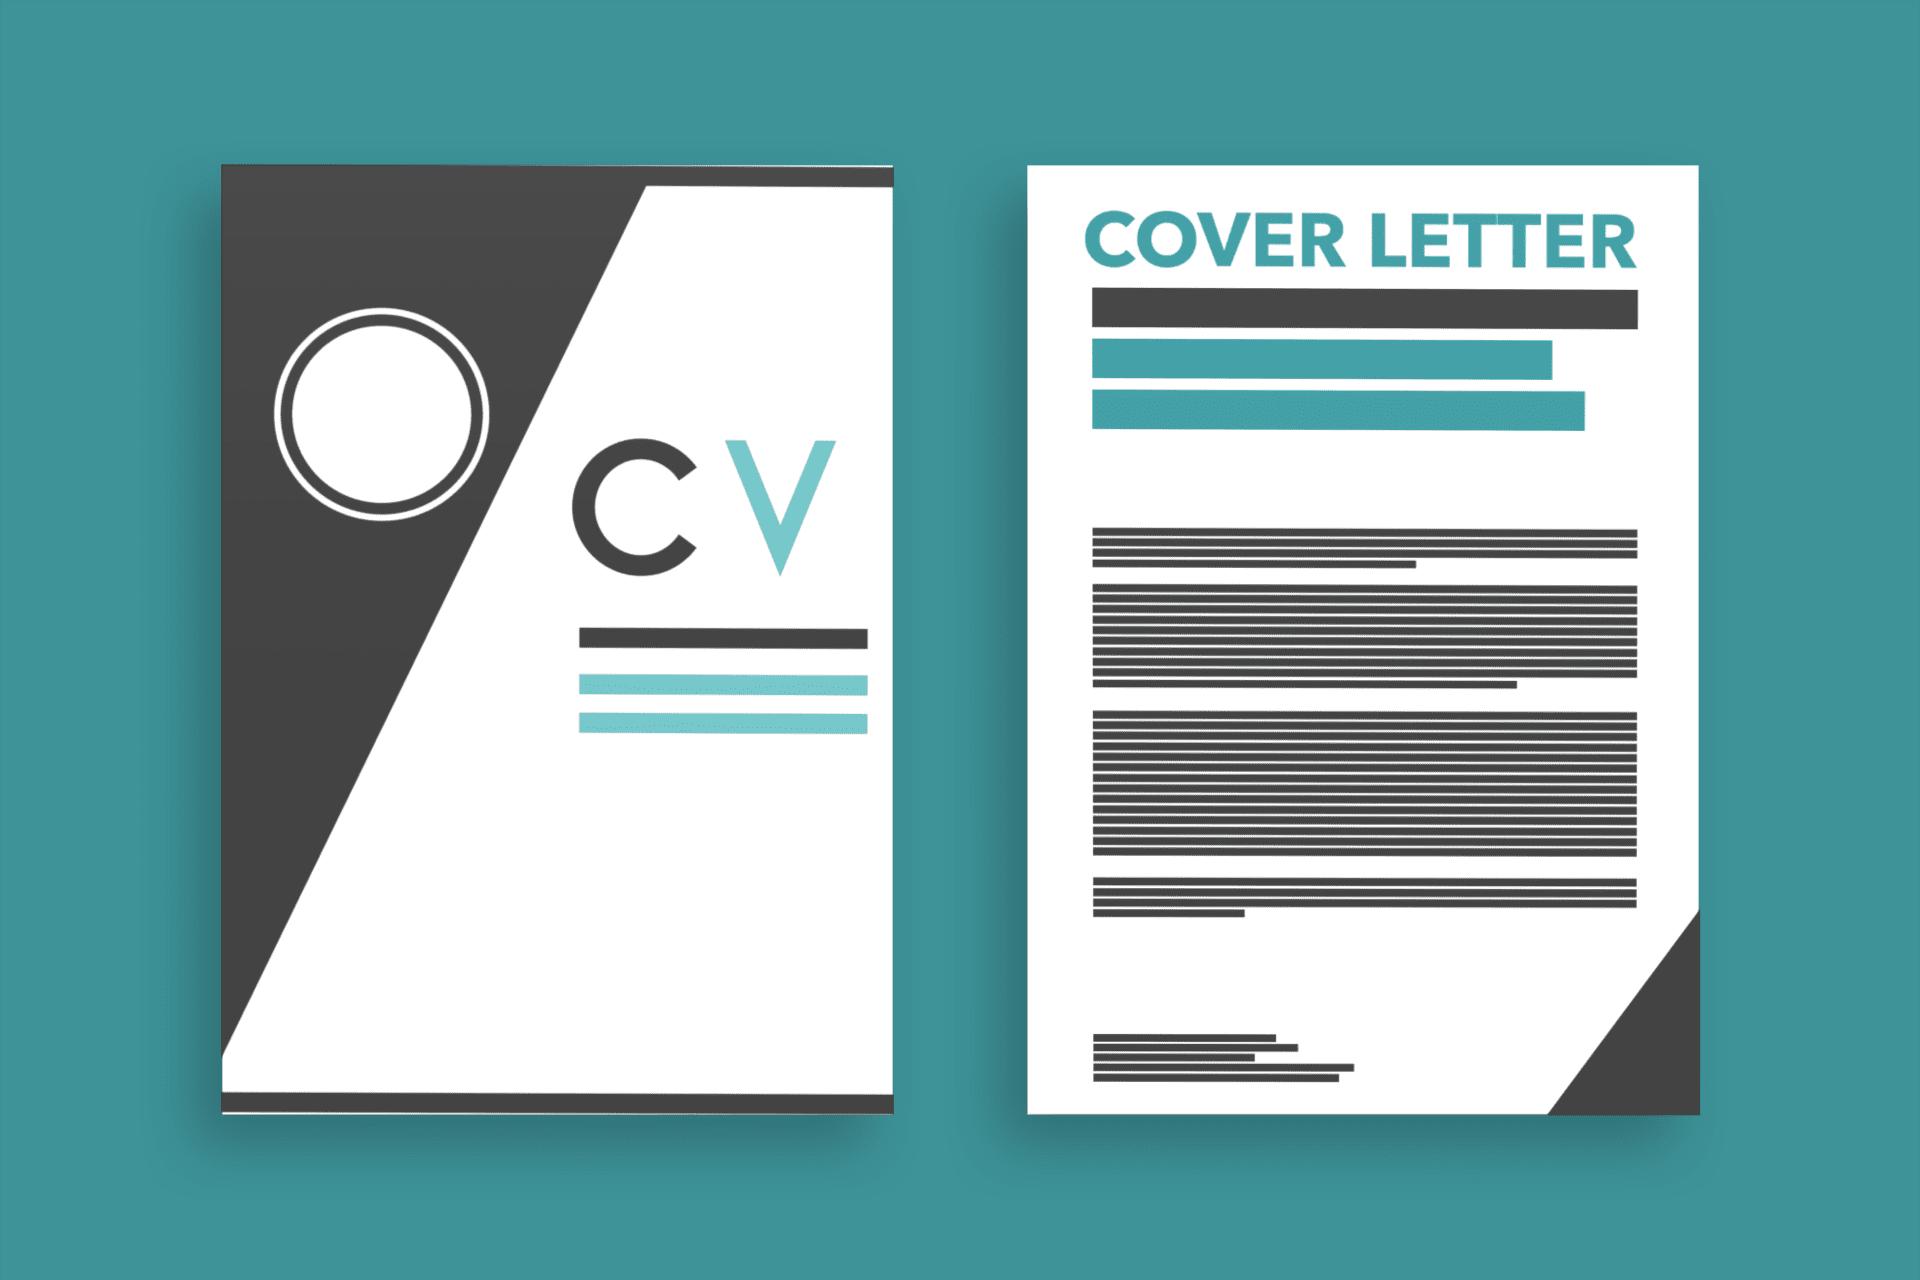 CV + CL